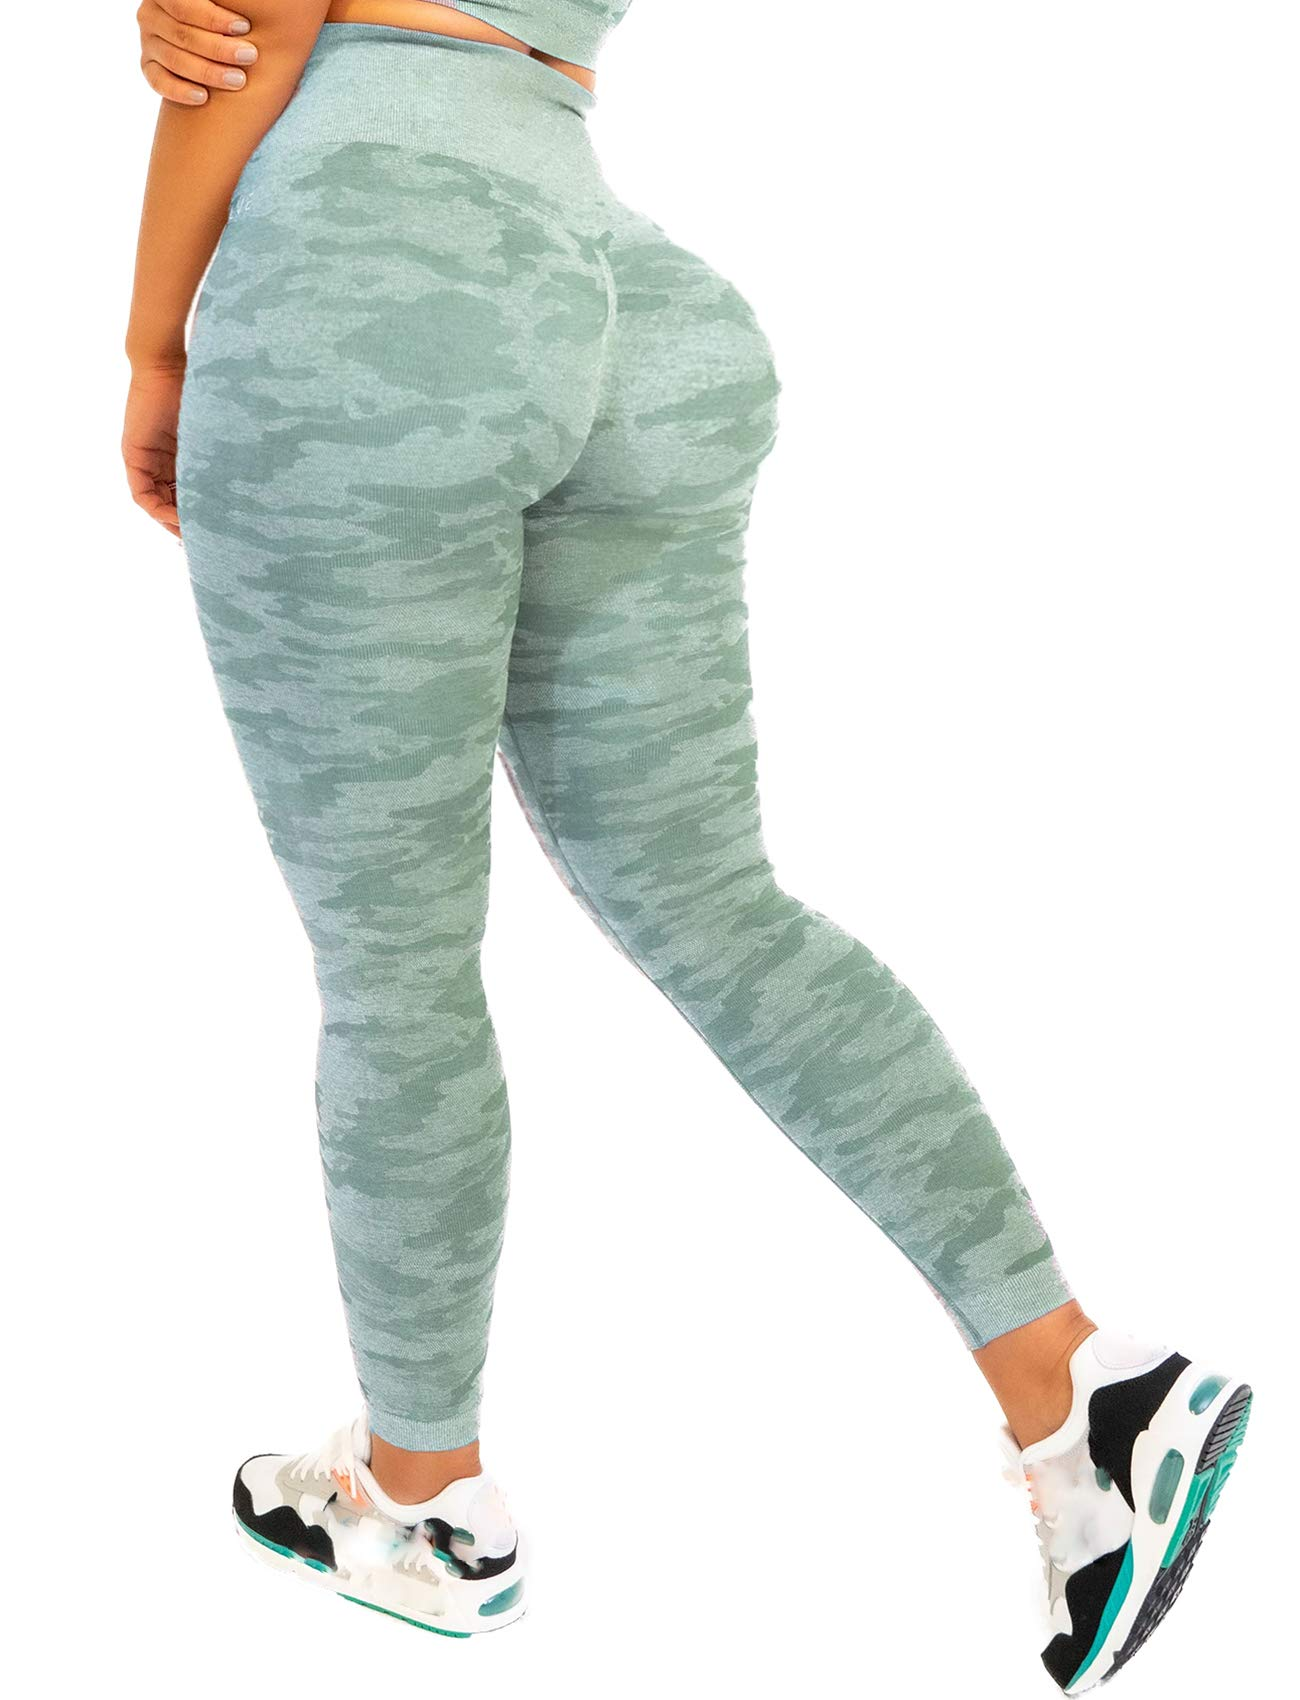 SEASUM Women Seamless Leggings High Waist Workout Yoga Pants Tummy Control Tight